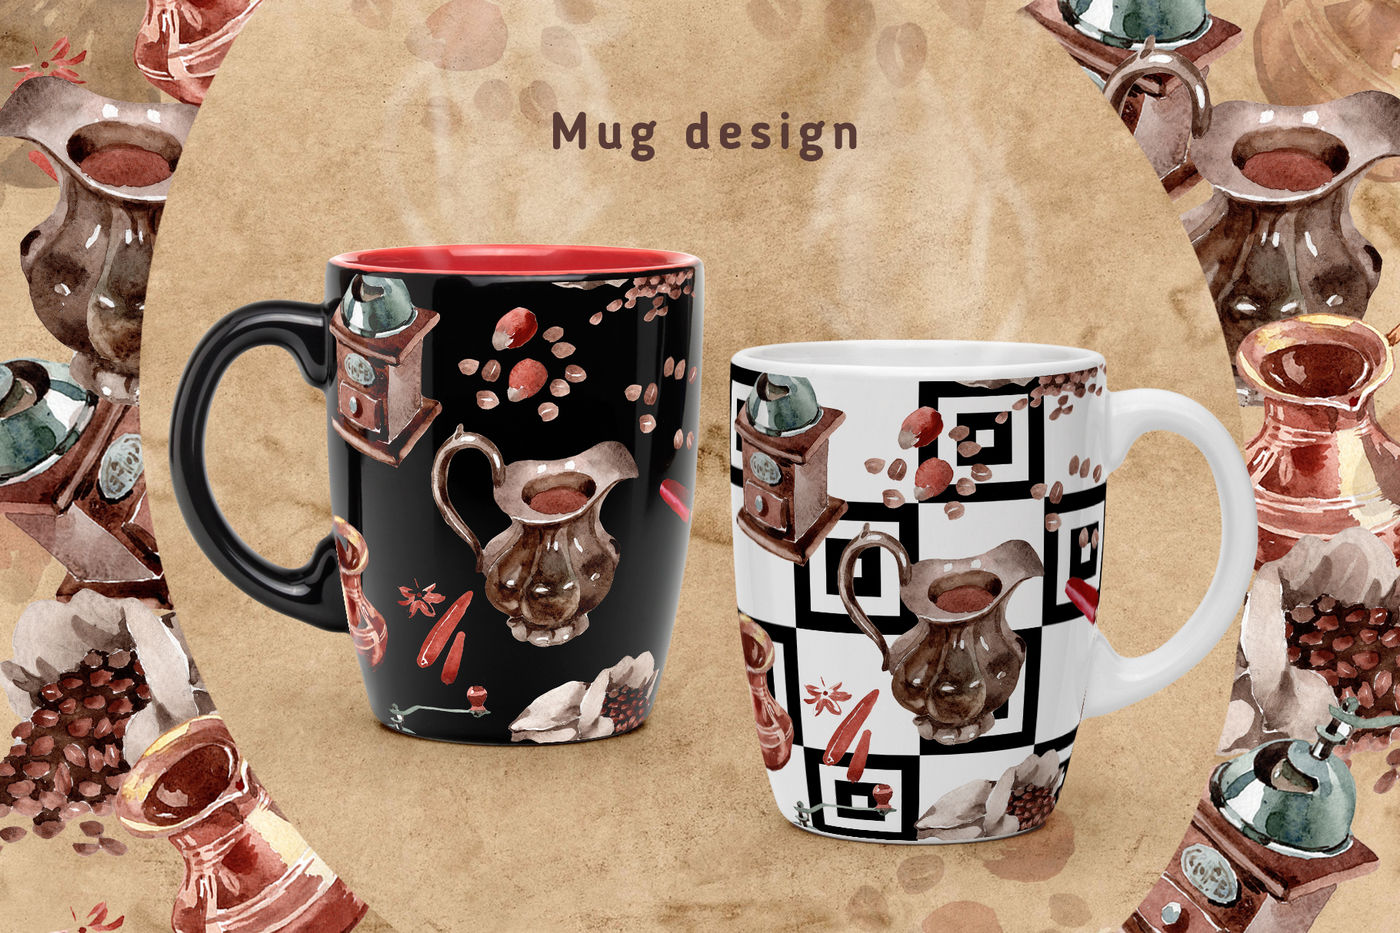 31款咖啡元素水彩剪贴画PNG免抠图片素材 Coffee House PNG Watercolor Set插图(1)